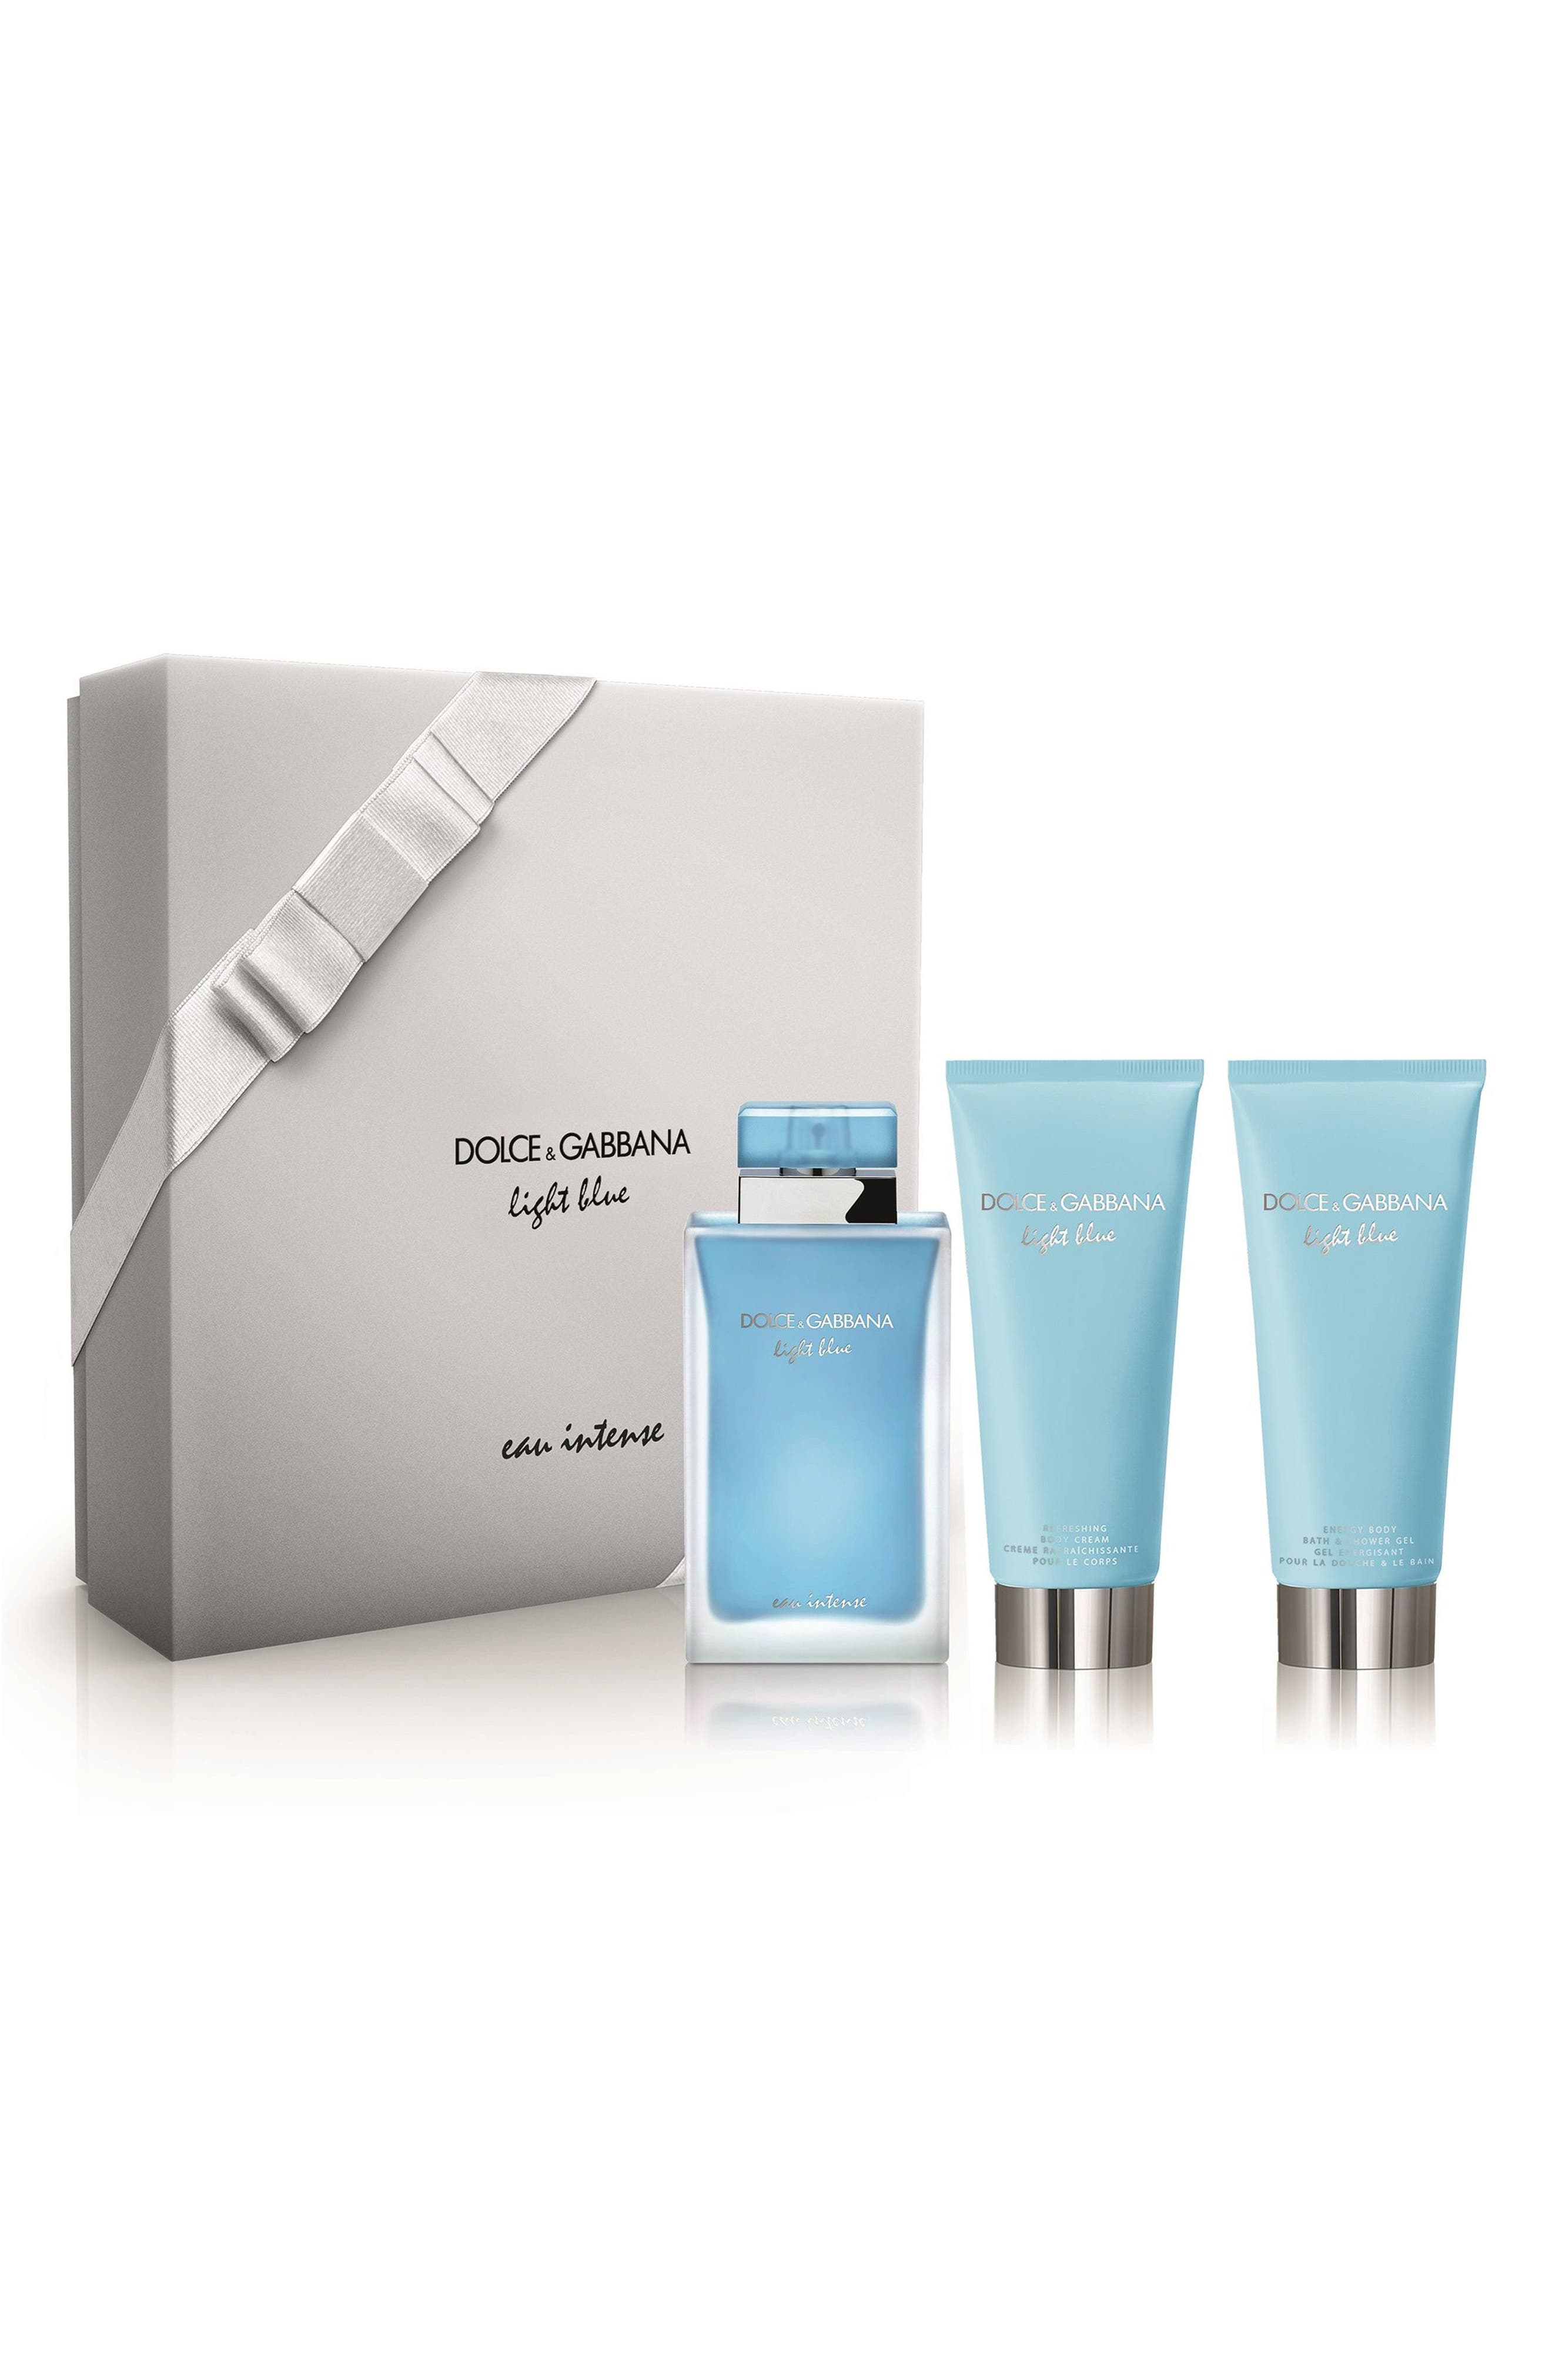 Main Image - Dolce&Gabbana Light Blue Eau Intense Set ($158 Value)